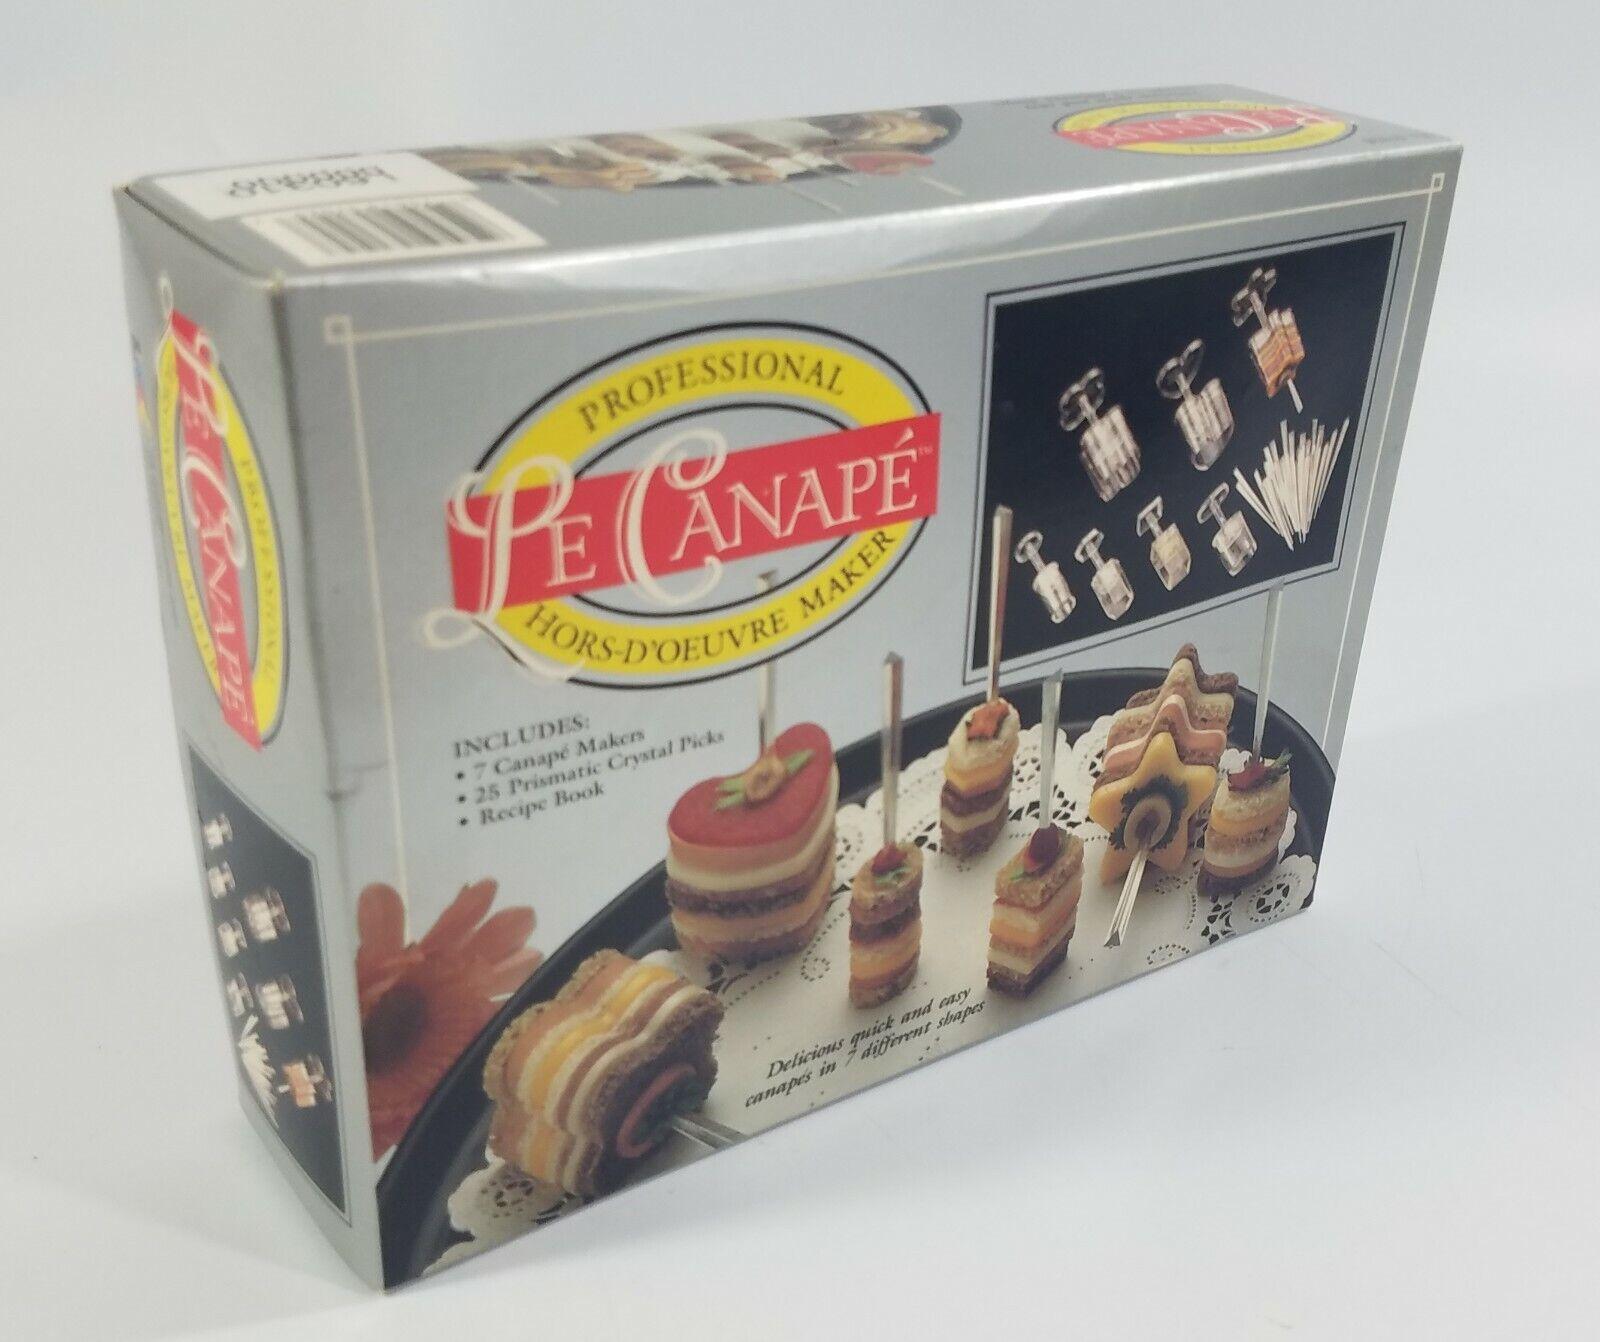 Le Canape Professional Hors D/'Oeuvre Maker New Vintage 1991 Set